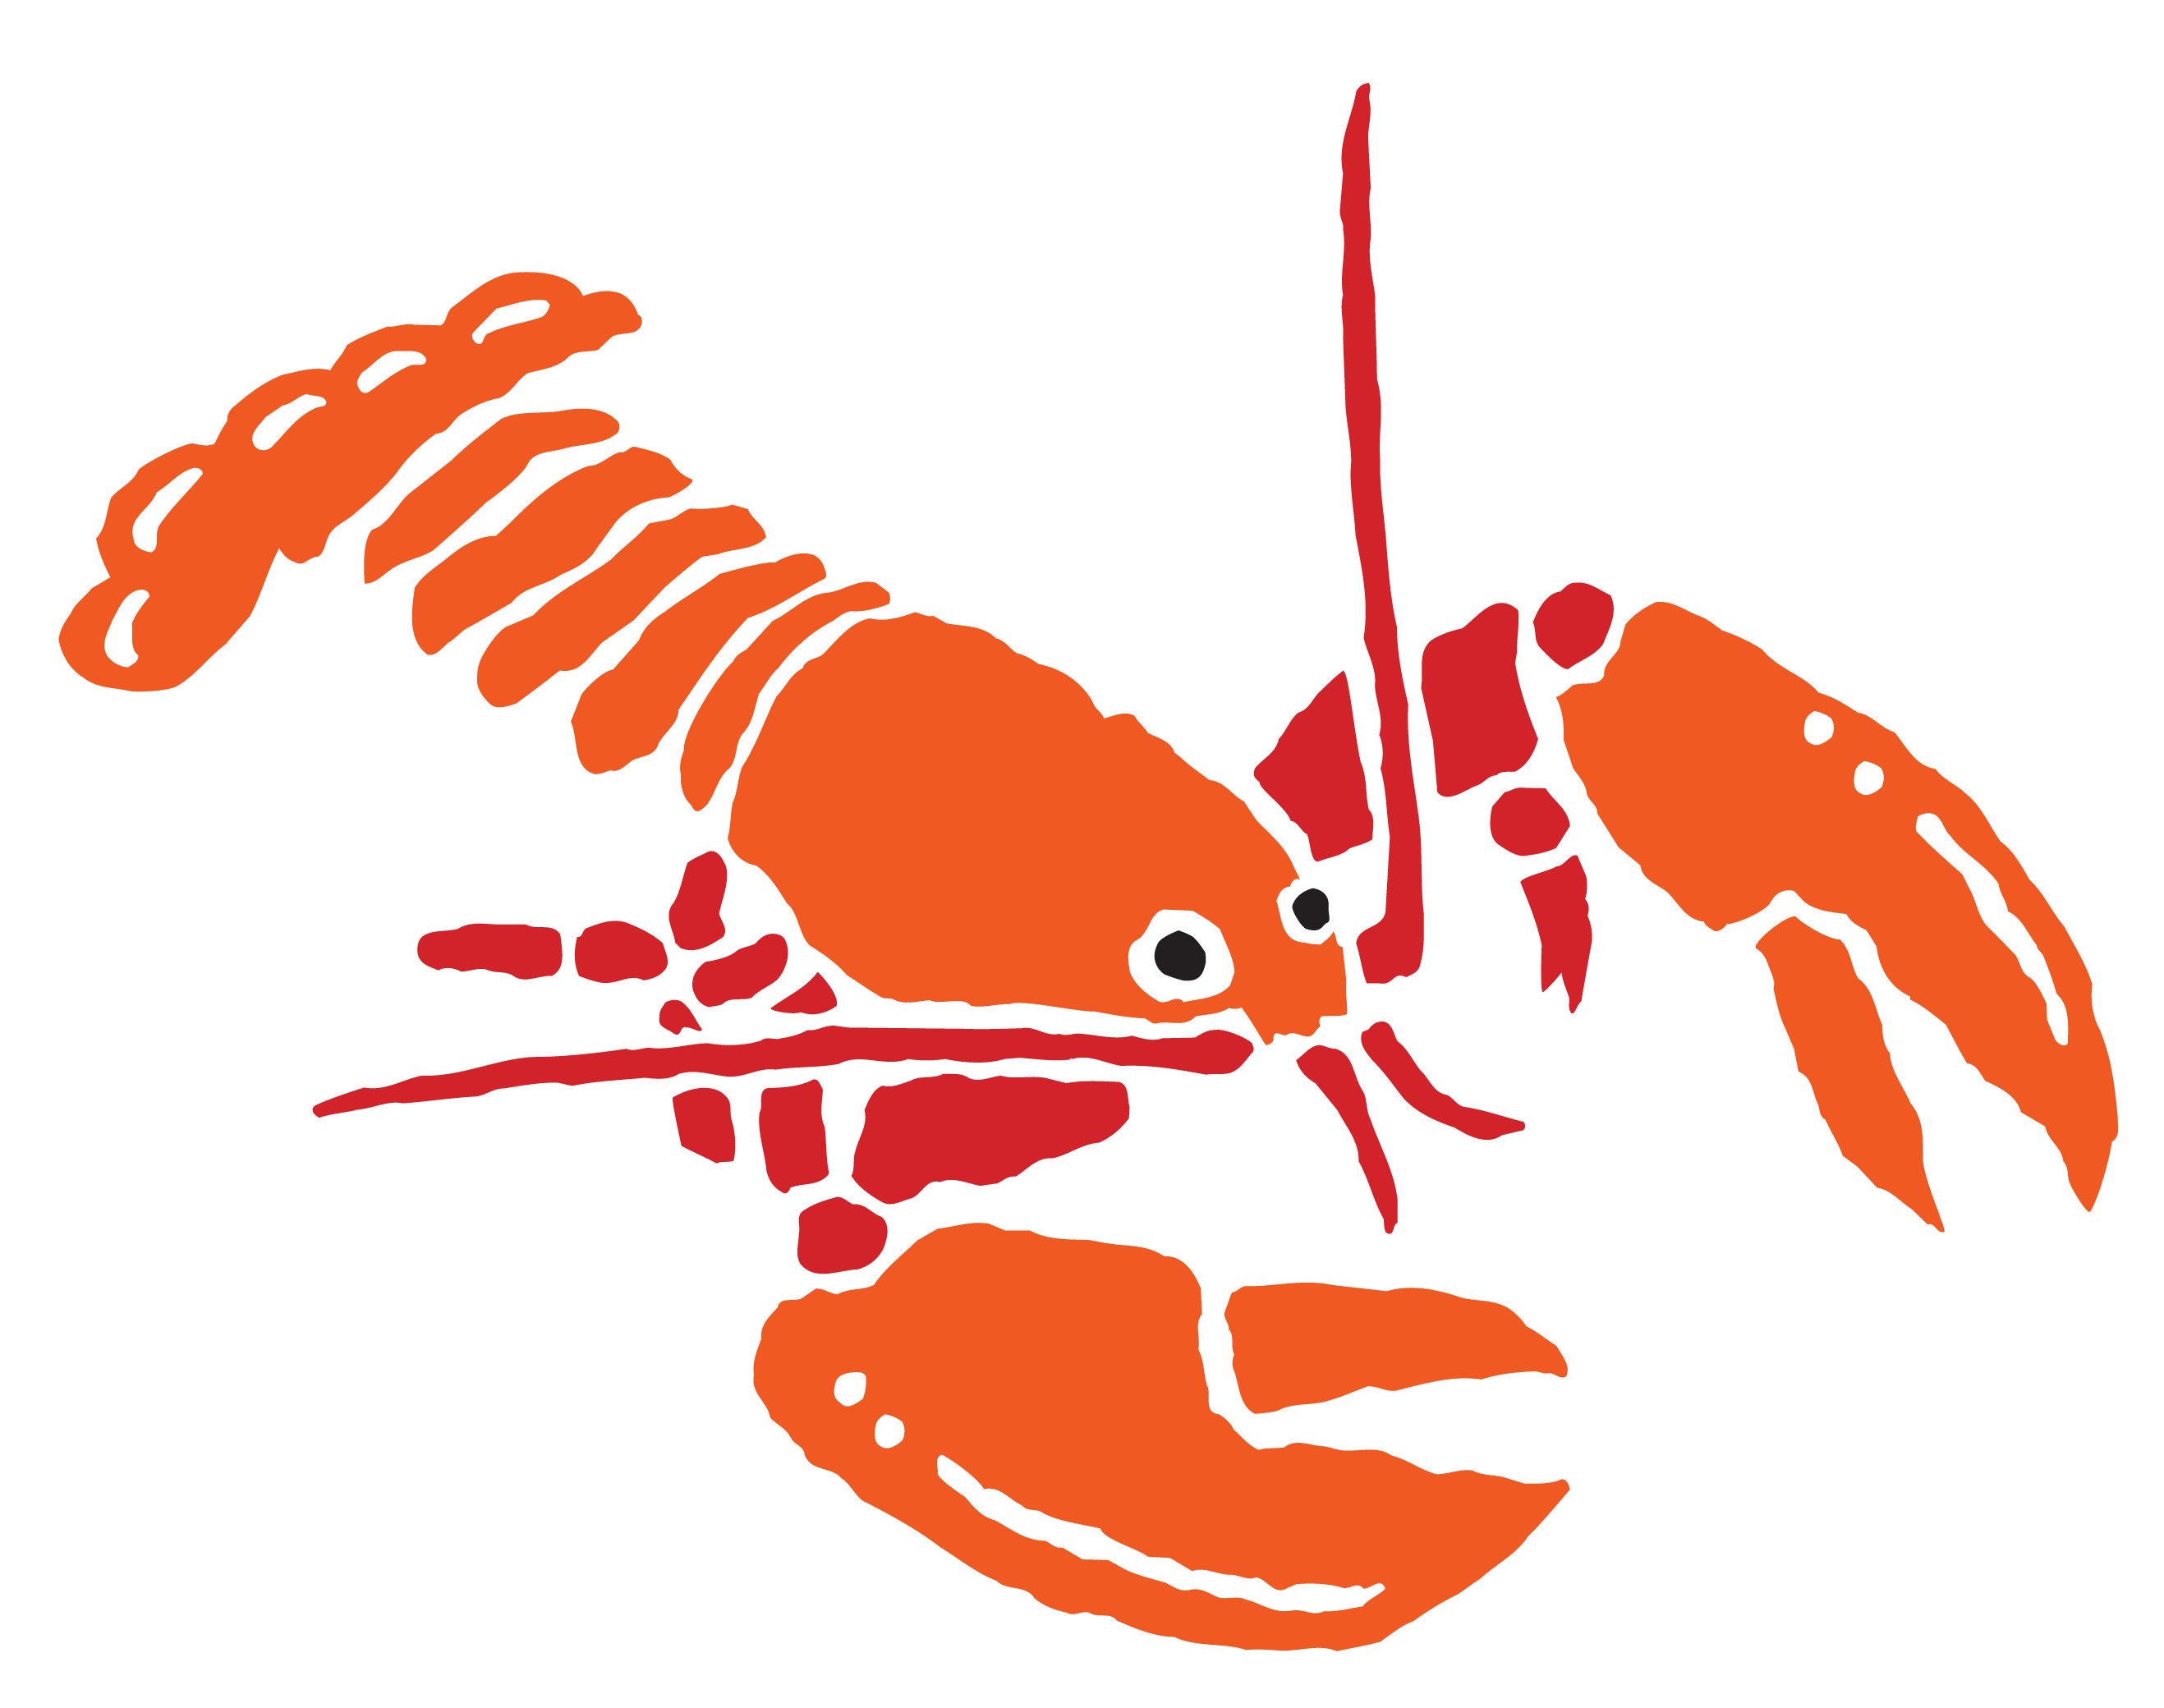 Index of fon r. Seafood clipart crayfish